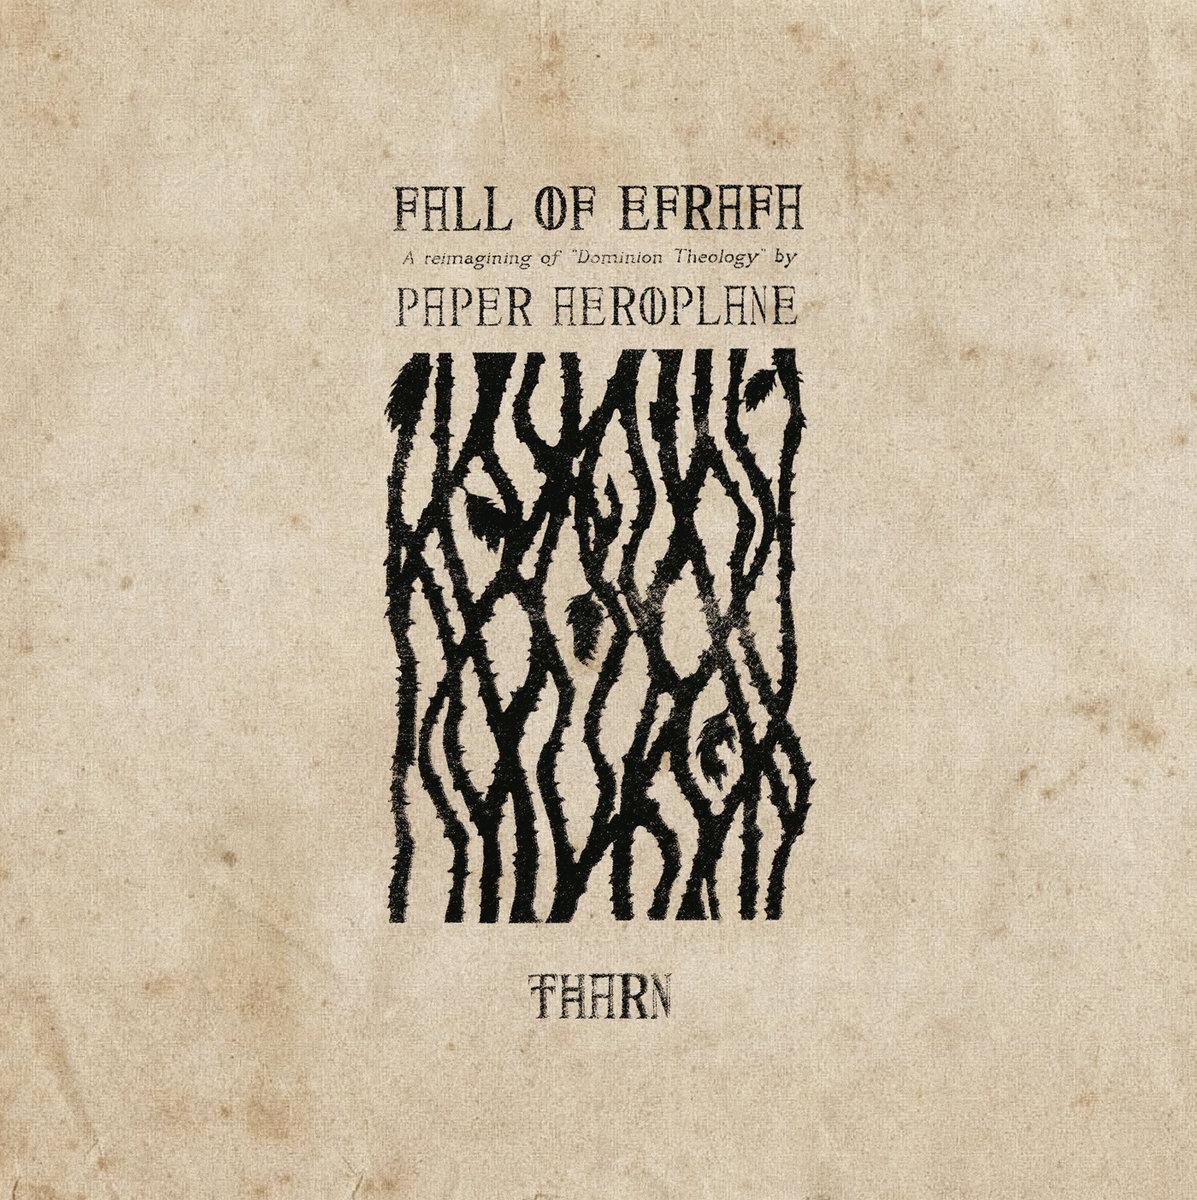 fall of efrafa no longer human